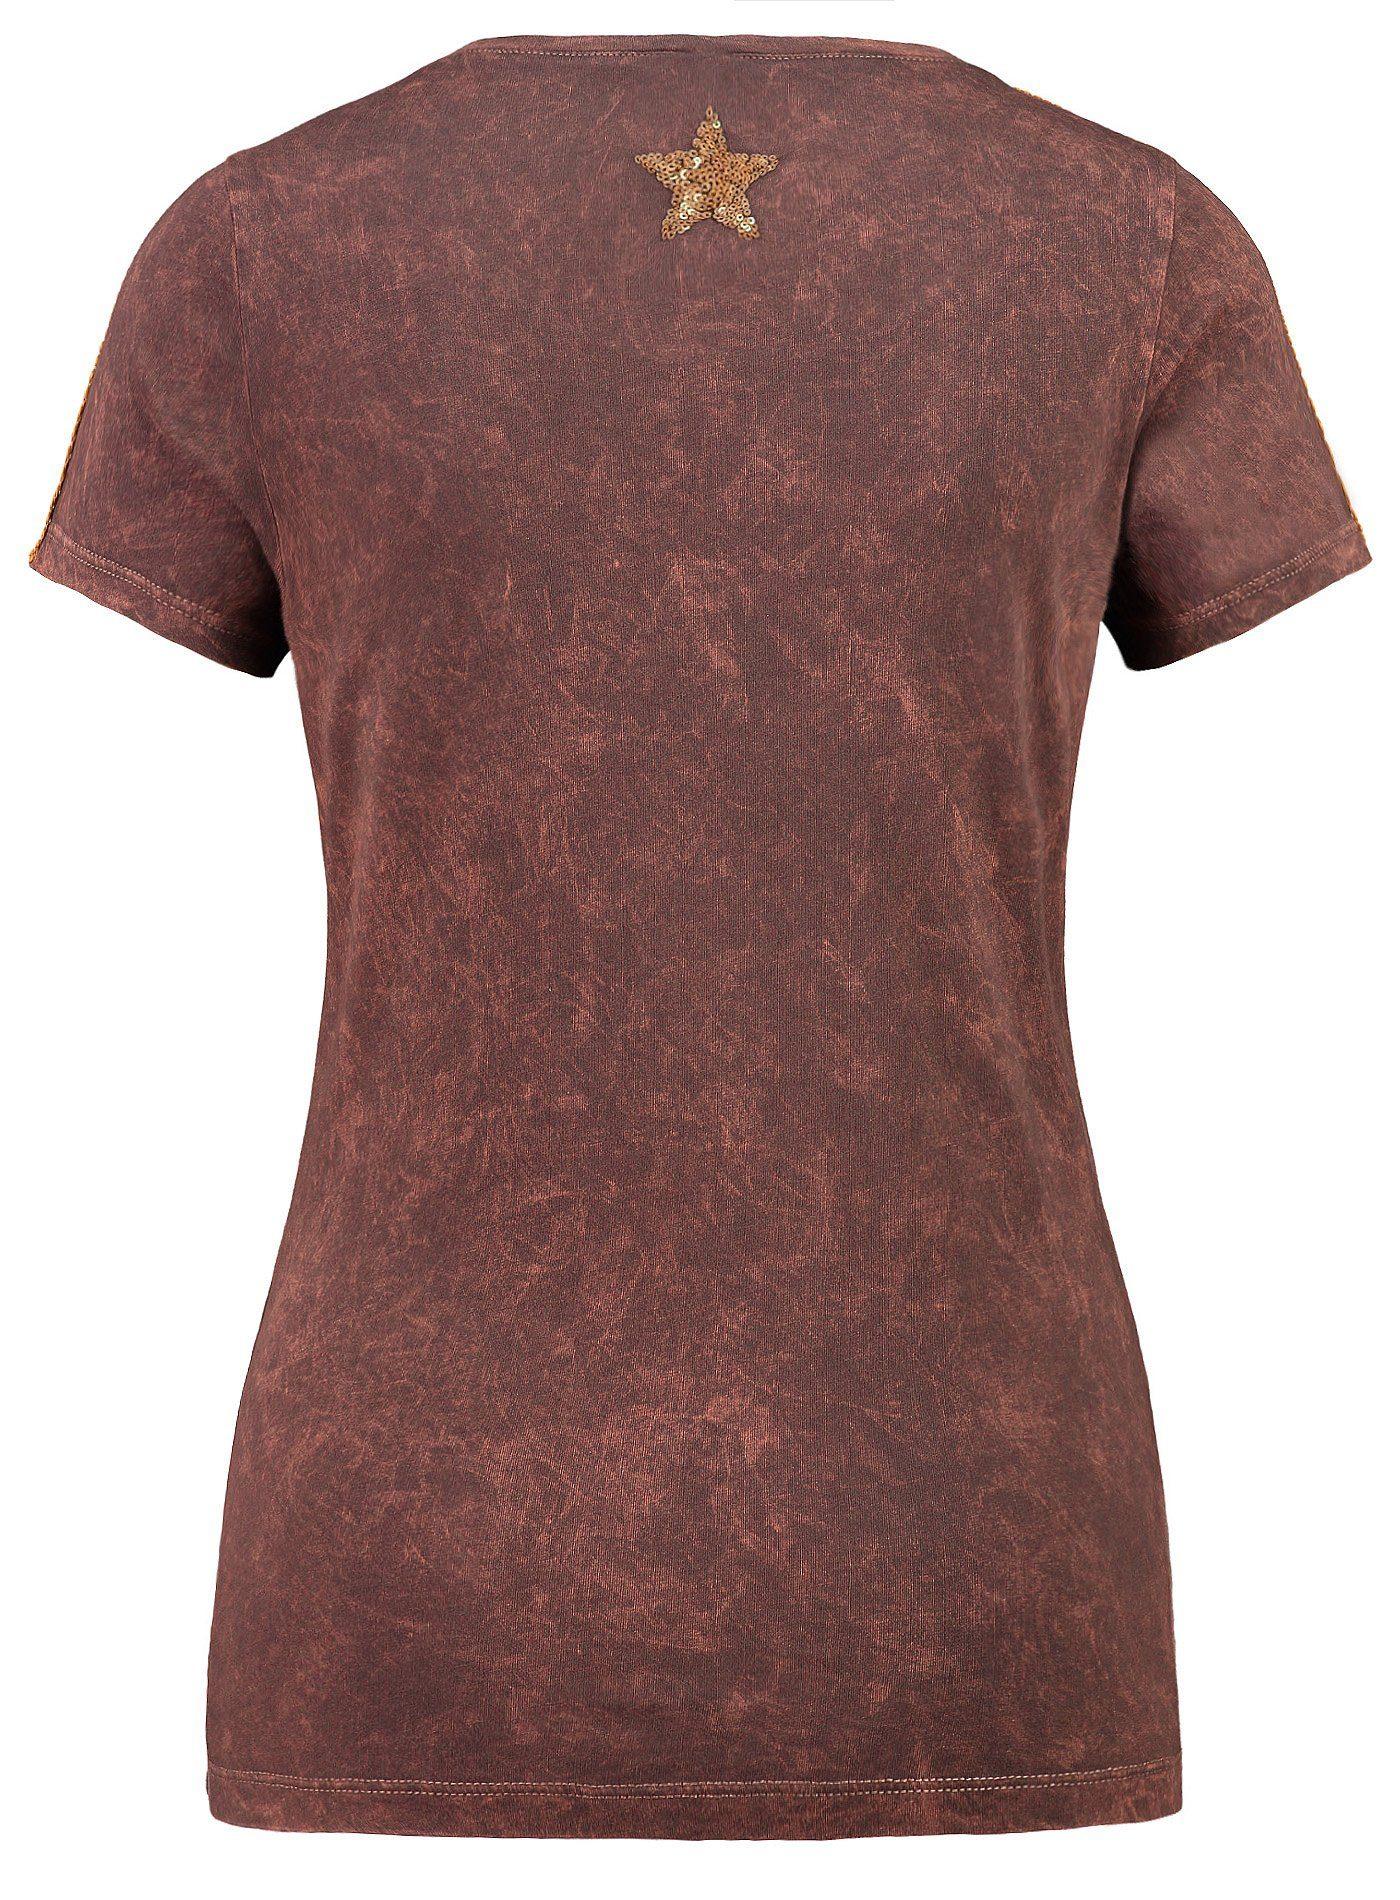 Key Largo T-Shirt WT Capital mit U-Boot-Ausschnitt